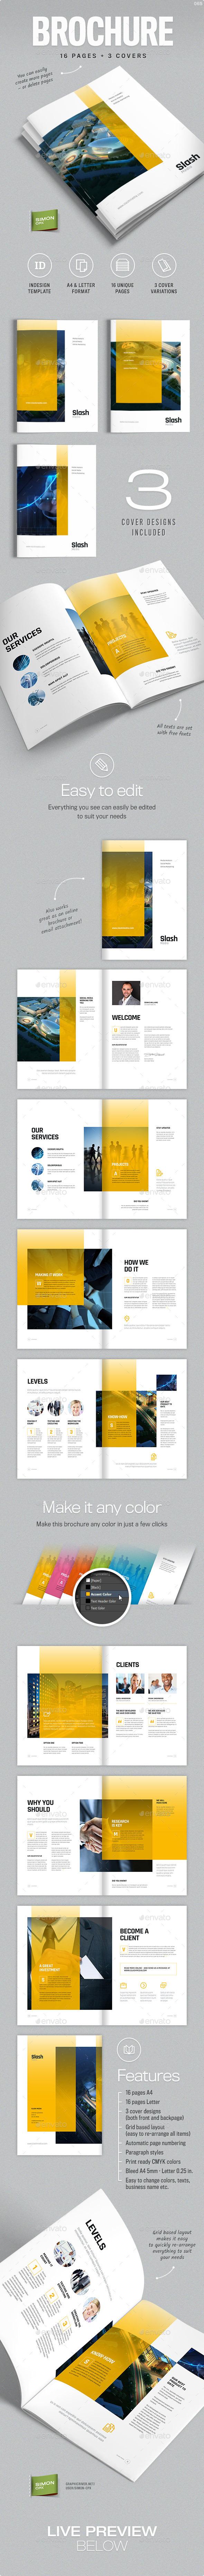 brochure indesign template editable logo business flyer a4 letter pdf - Brochure Template A4 and Letter - Slash Download